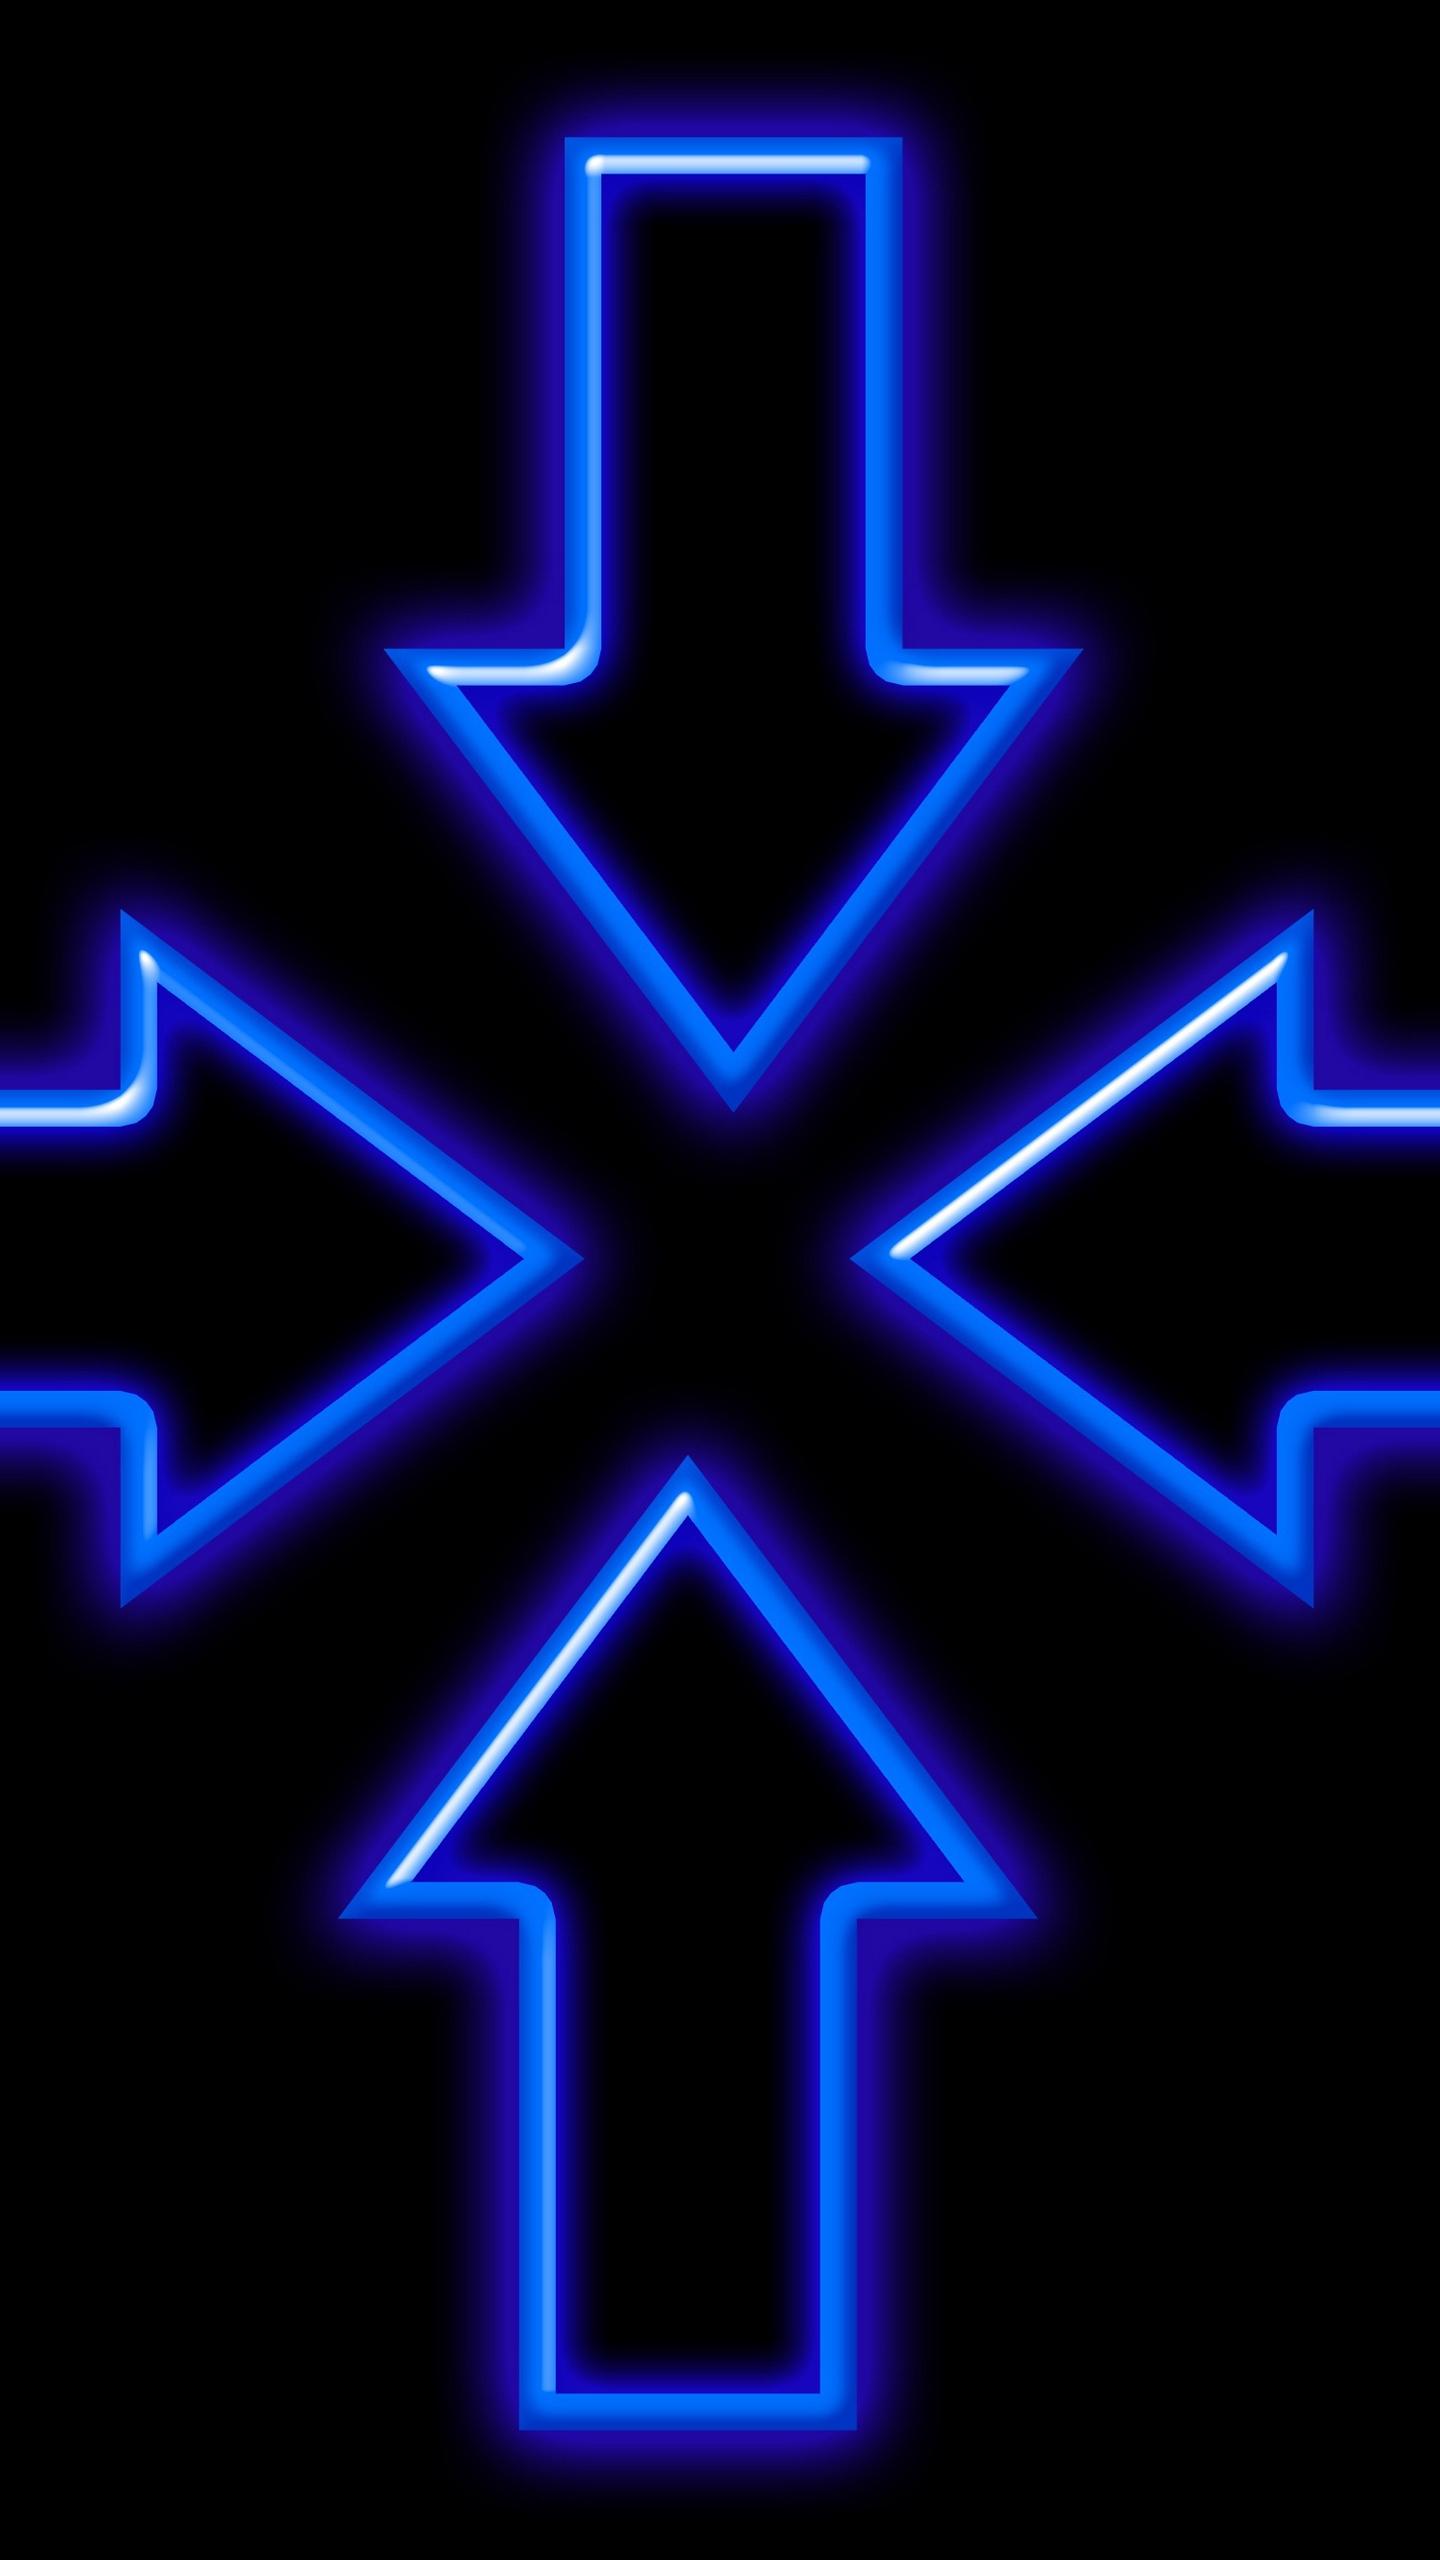 Wallpaper Arrows, Neon, Lights, Blue - Neon Light Blue - HD Wallpaper